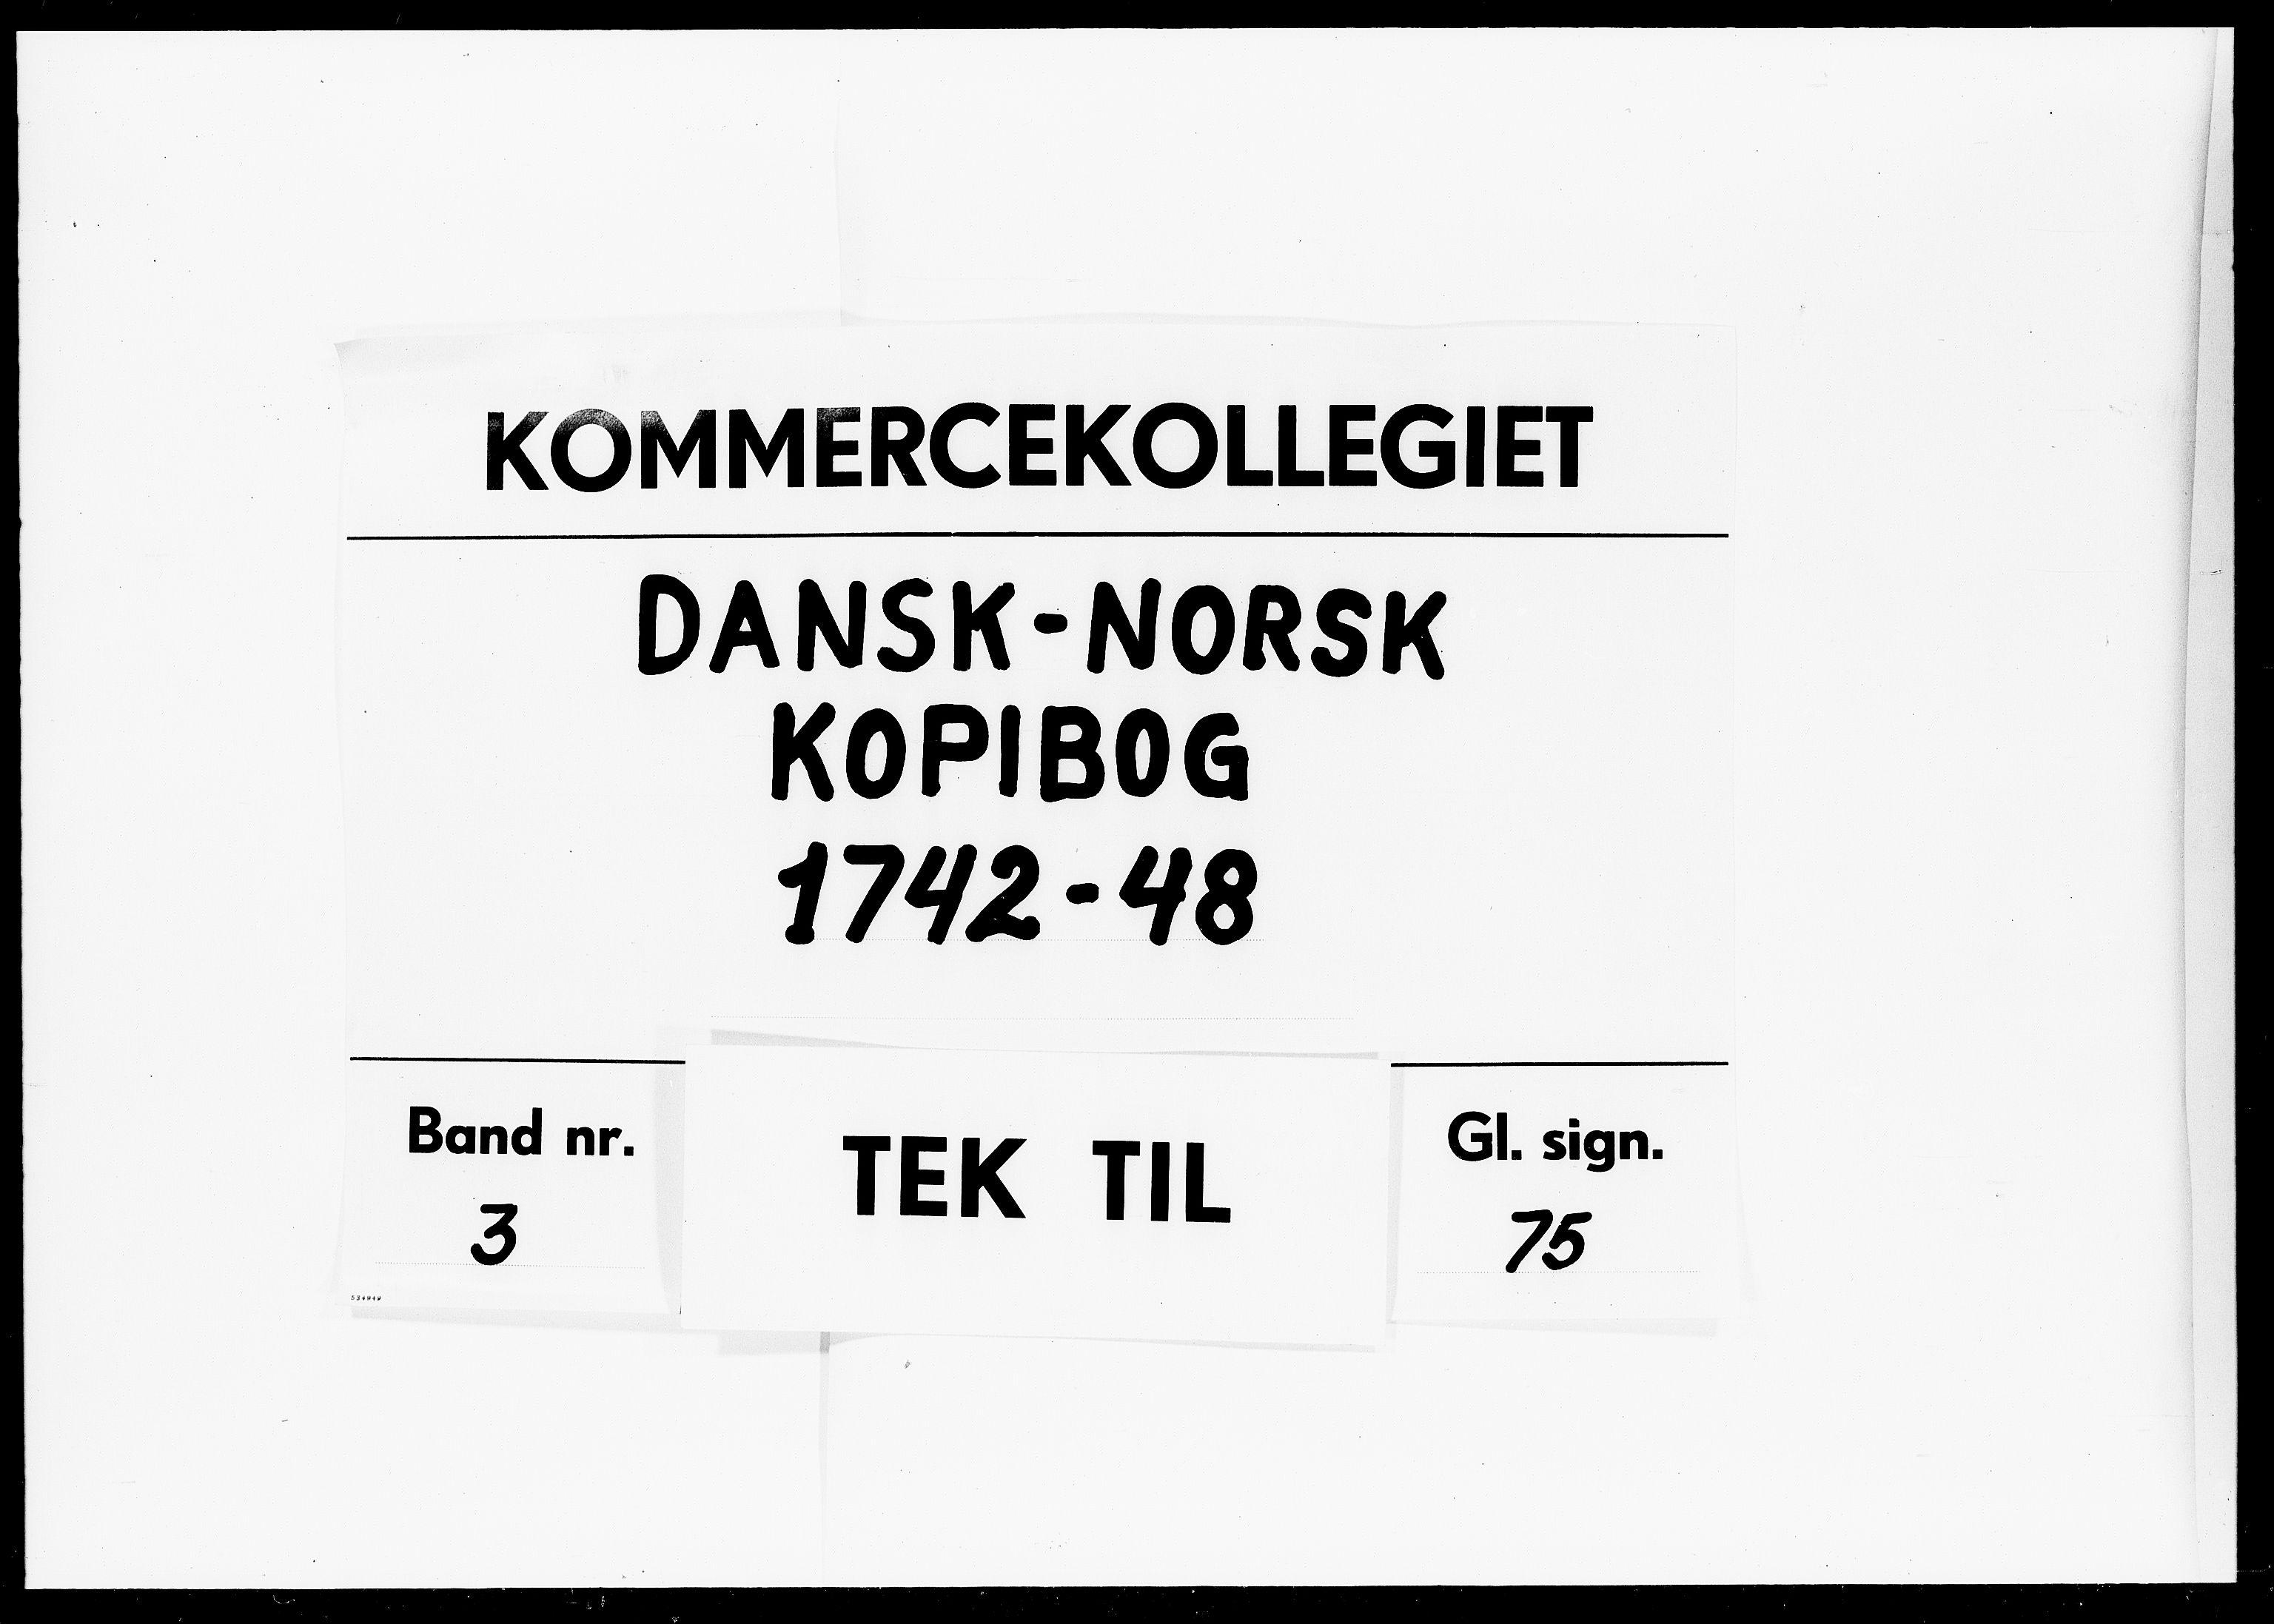 DRA, Kommercekollegiet, Dansk-Norske Sekretariat, -/43: Dansk-Norsk kopibog, 1742-1748